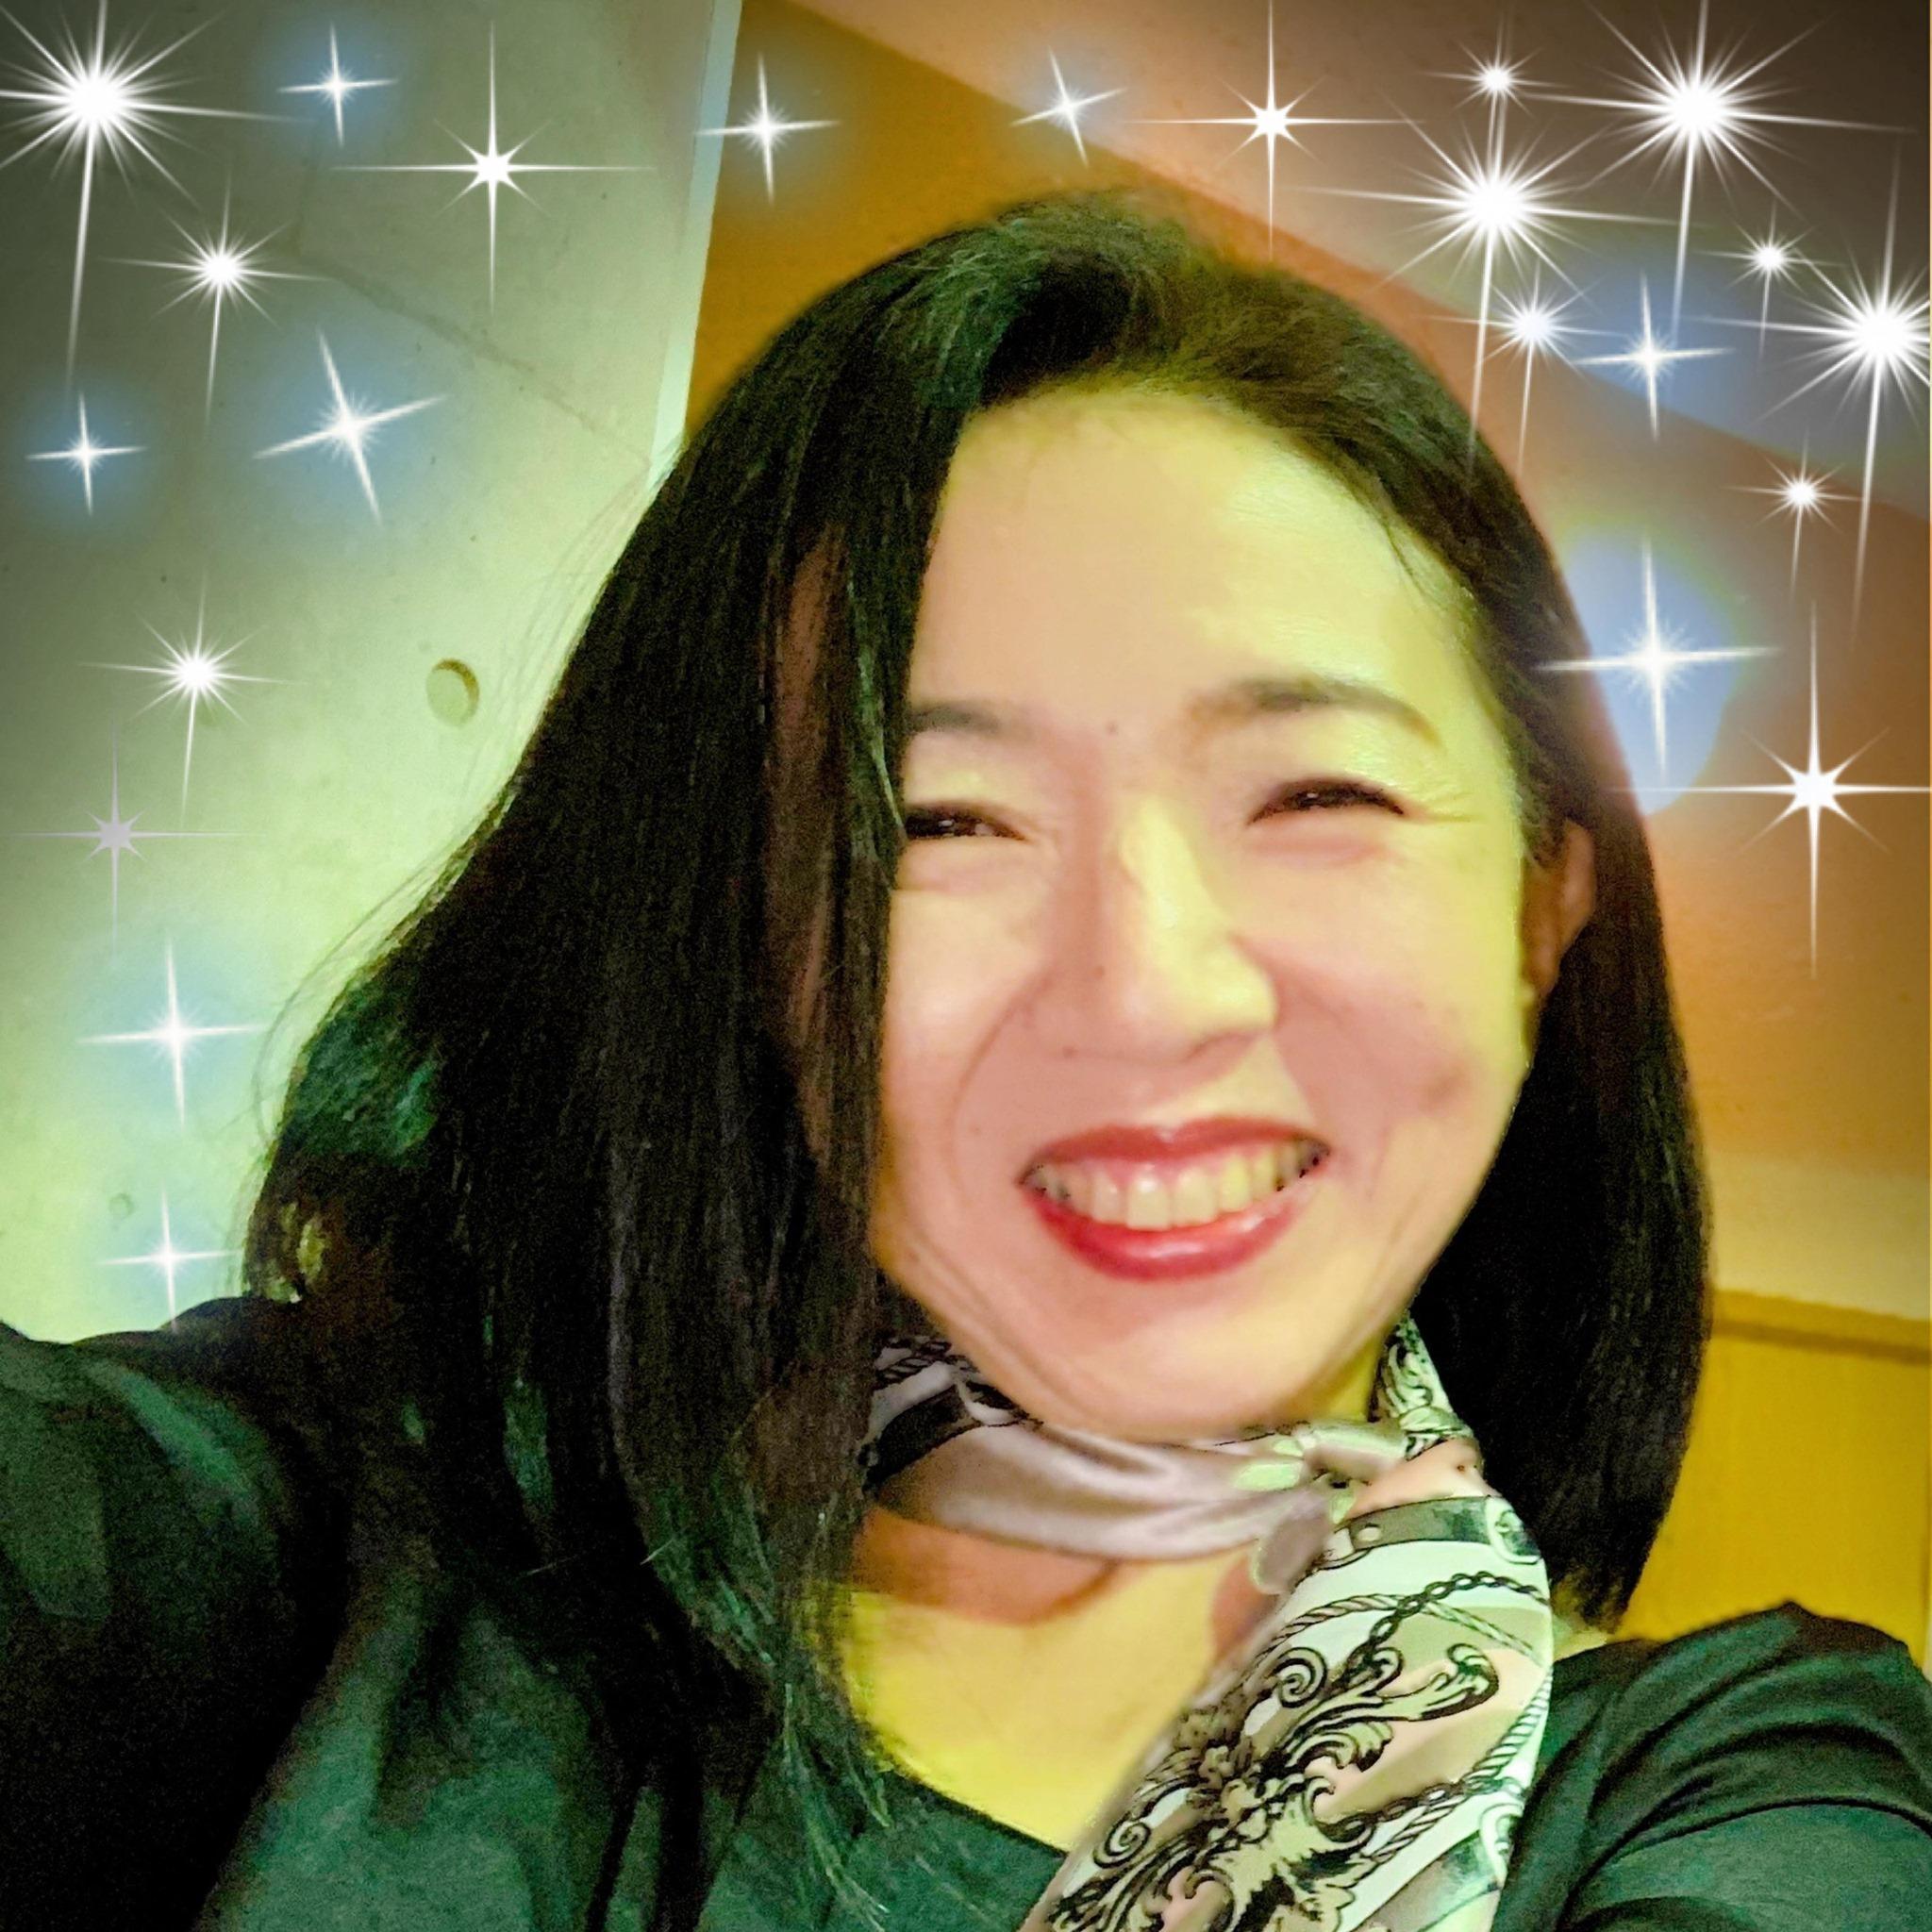 @keikoshinozaki Profile Image | Linktree